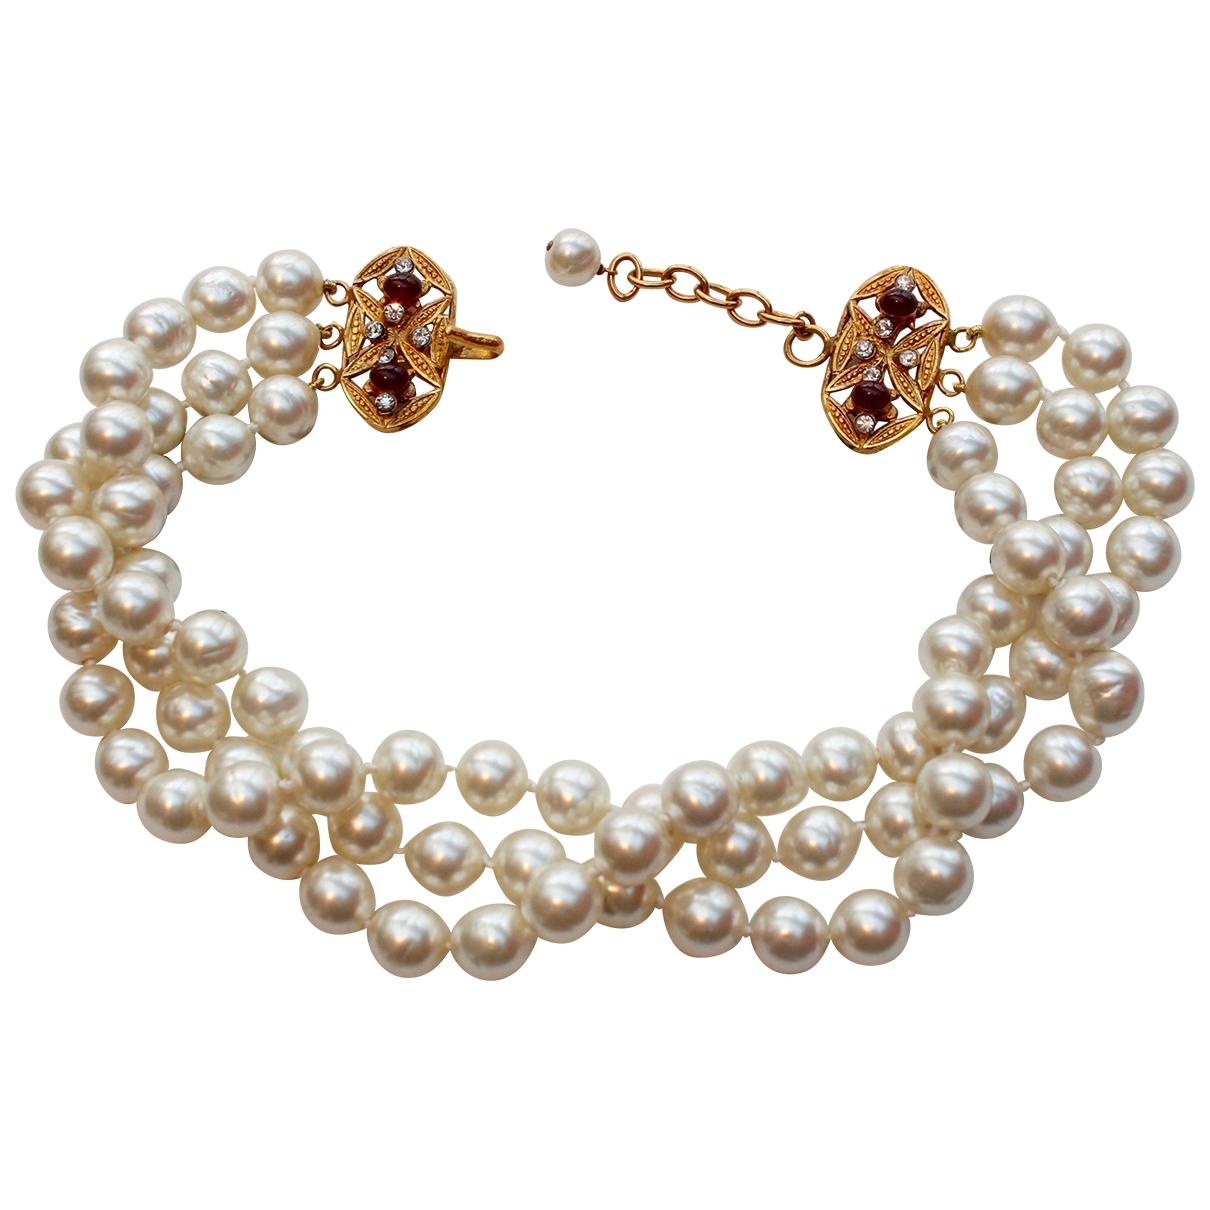 Chanel Baroque Kette in Perlen